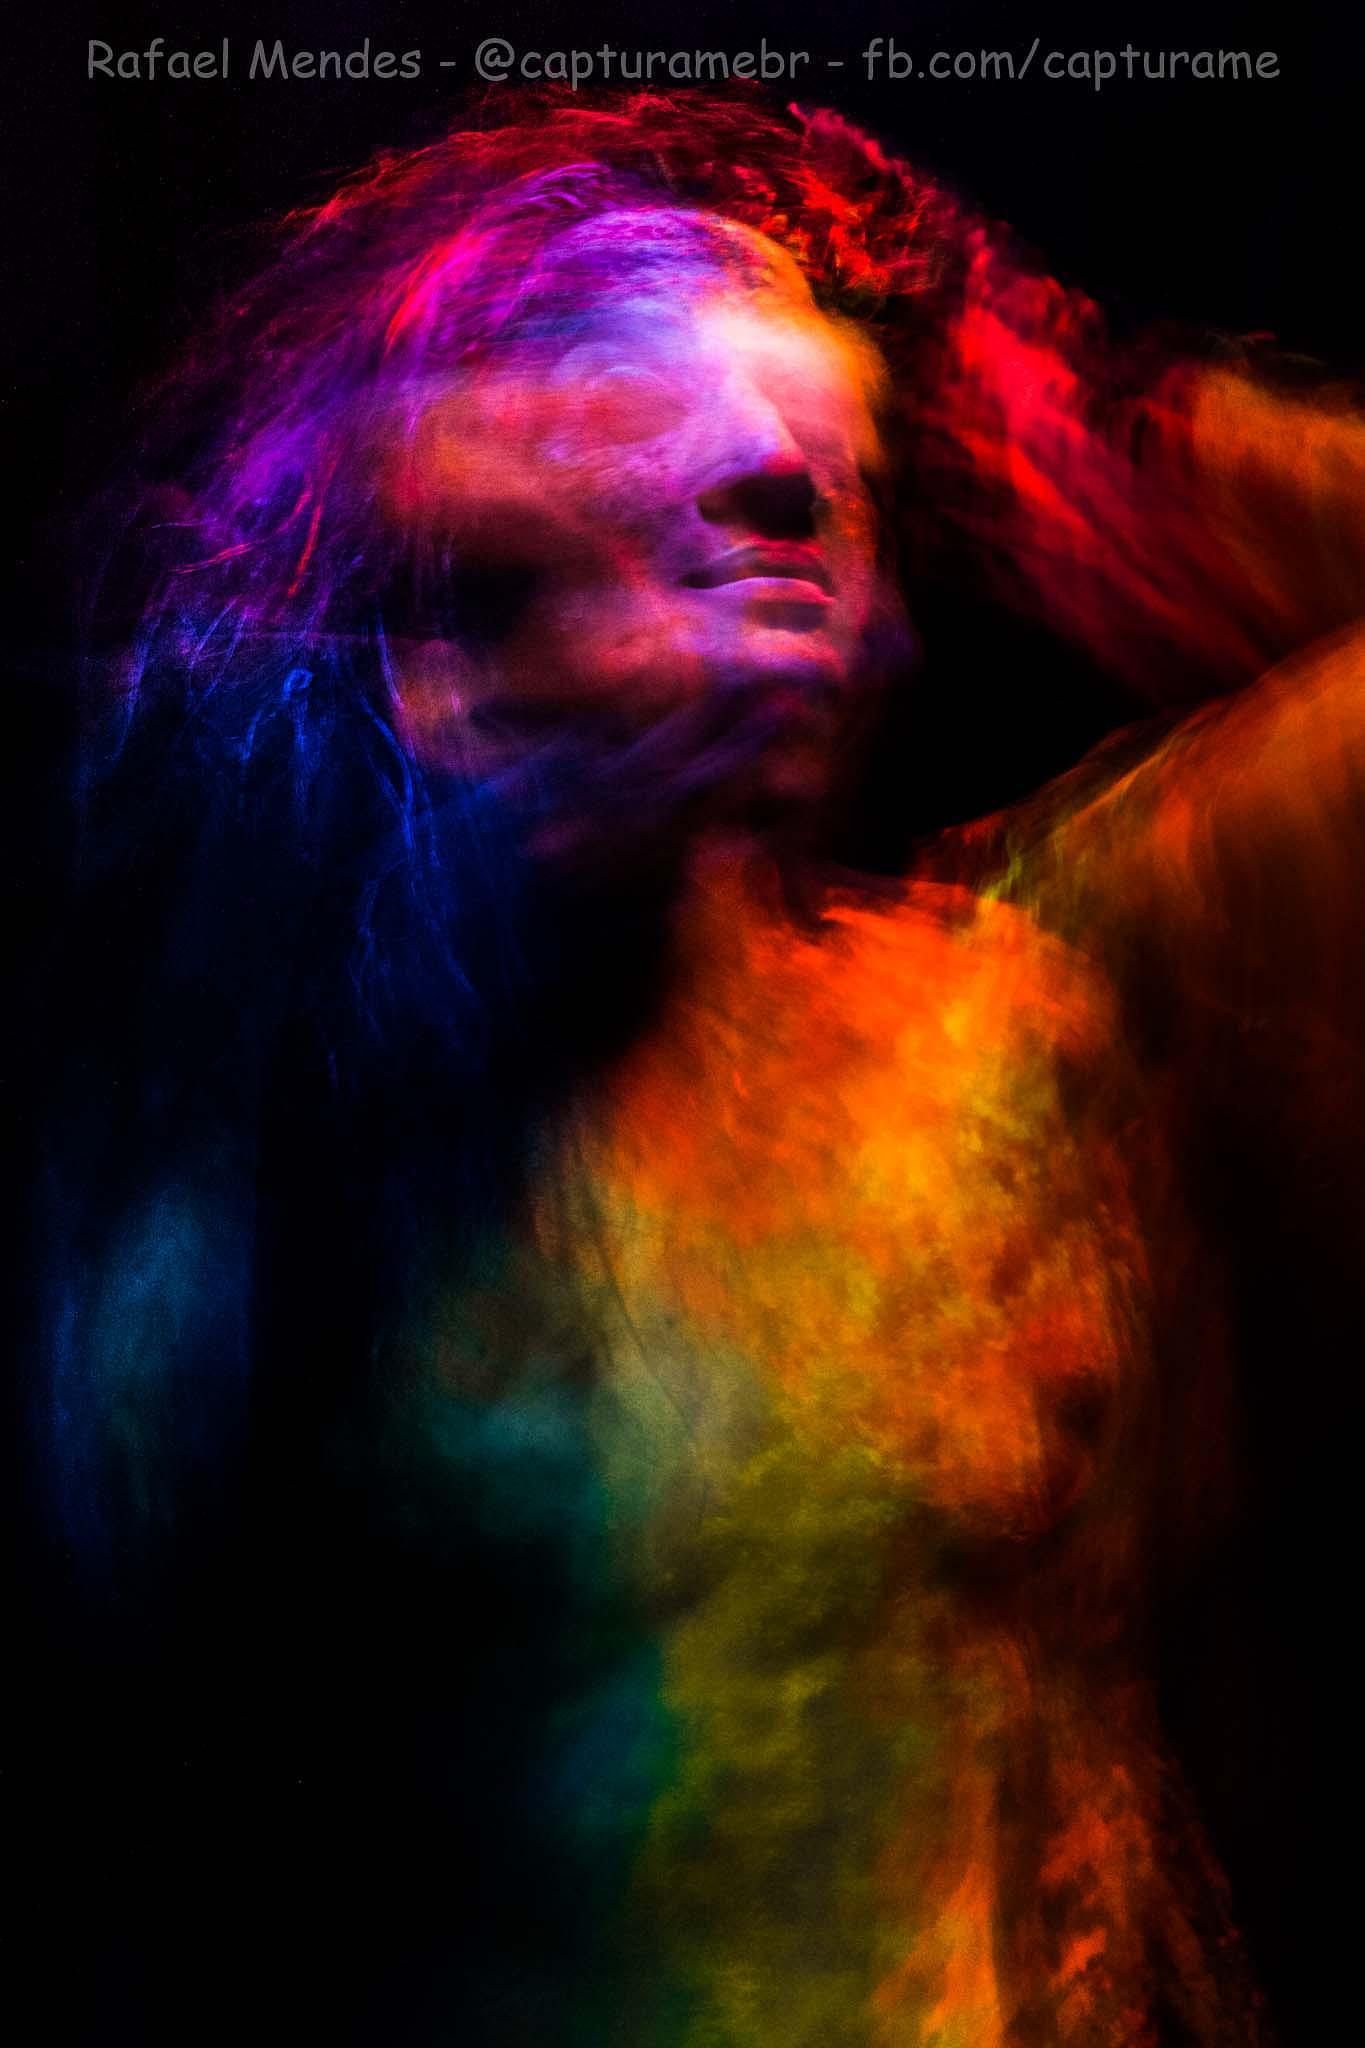 Blur by joserafaelmb